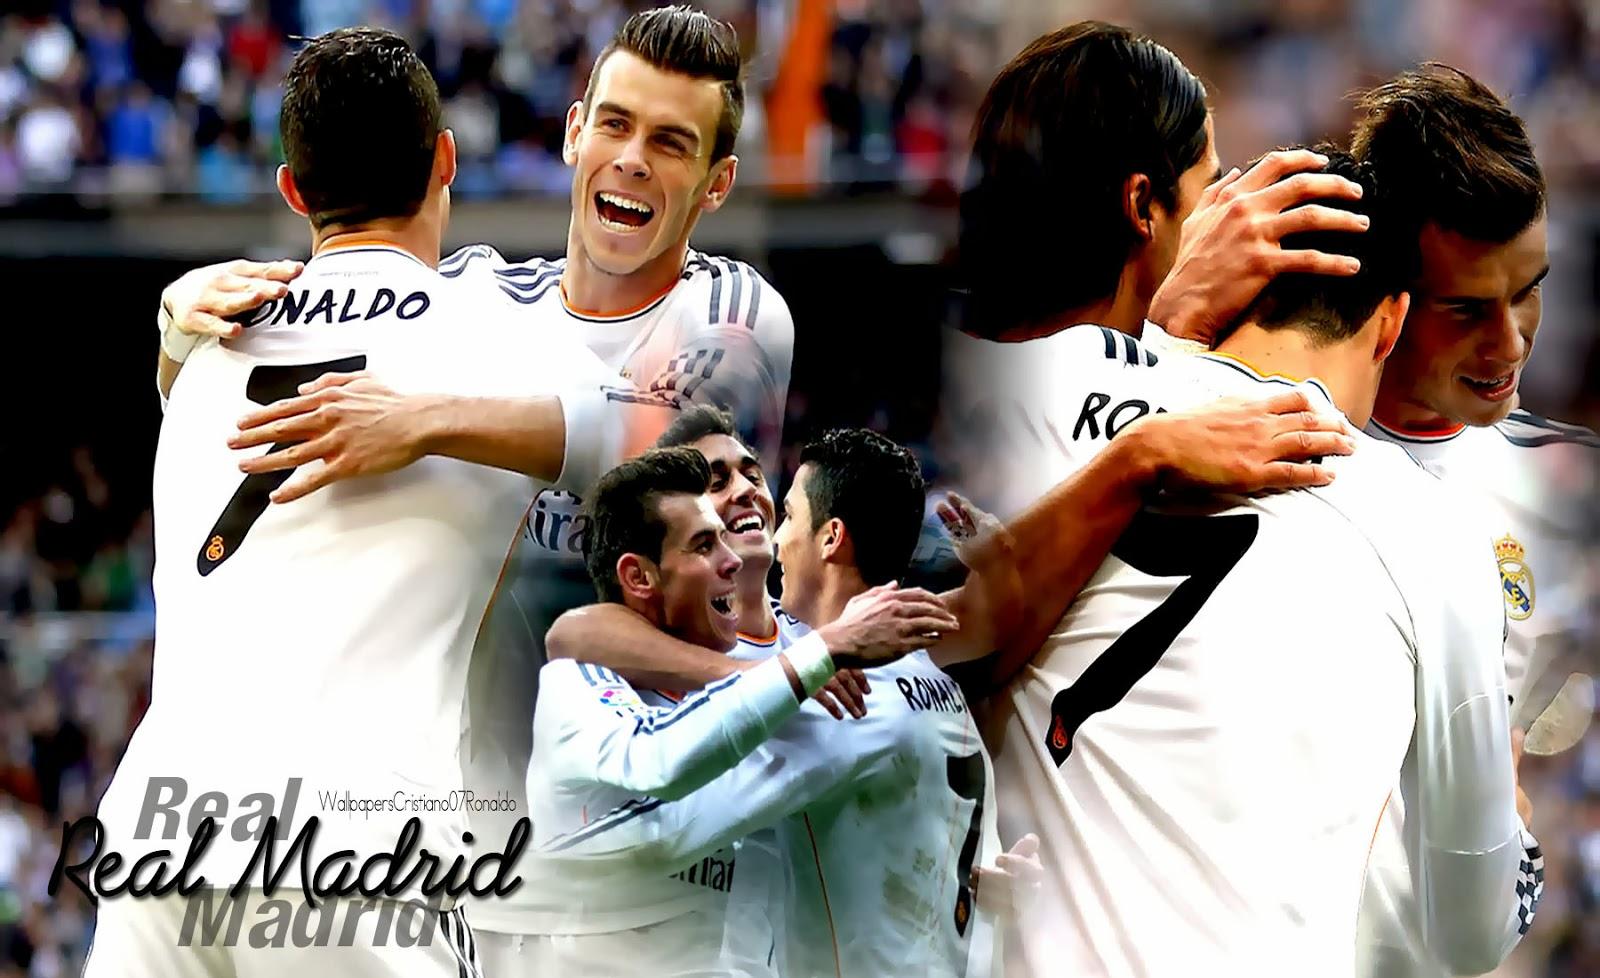 Cristiano Ronaldo Wallpapers: December 2013